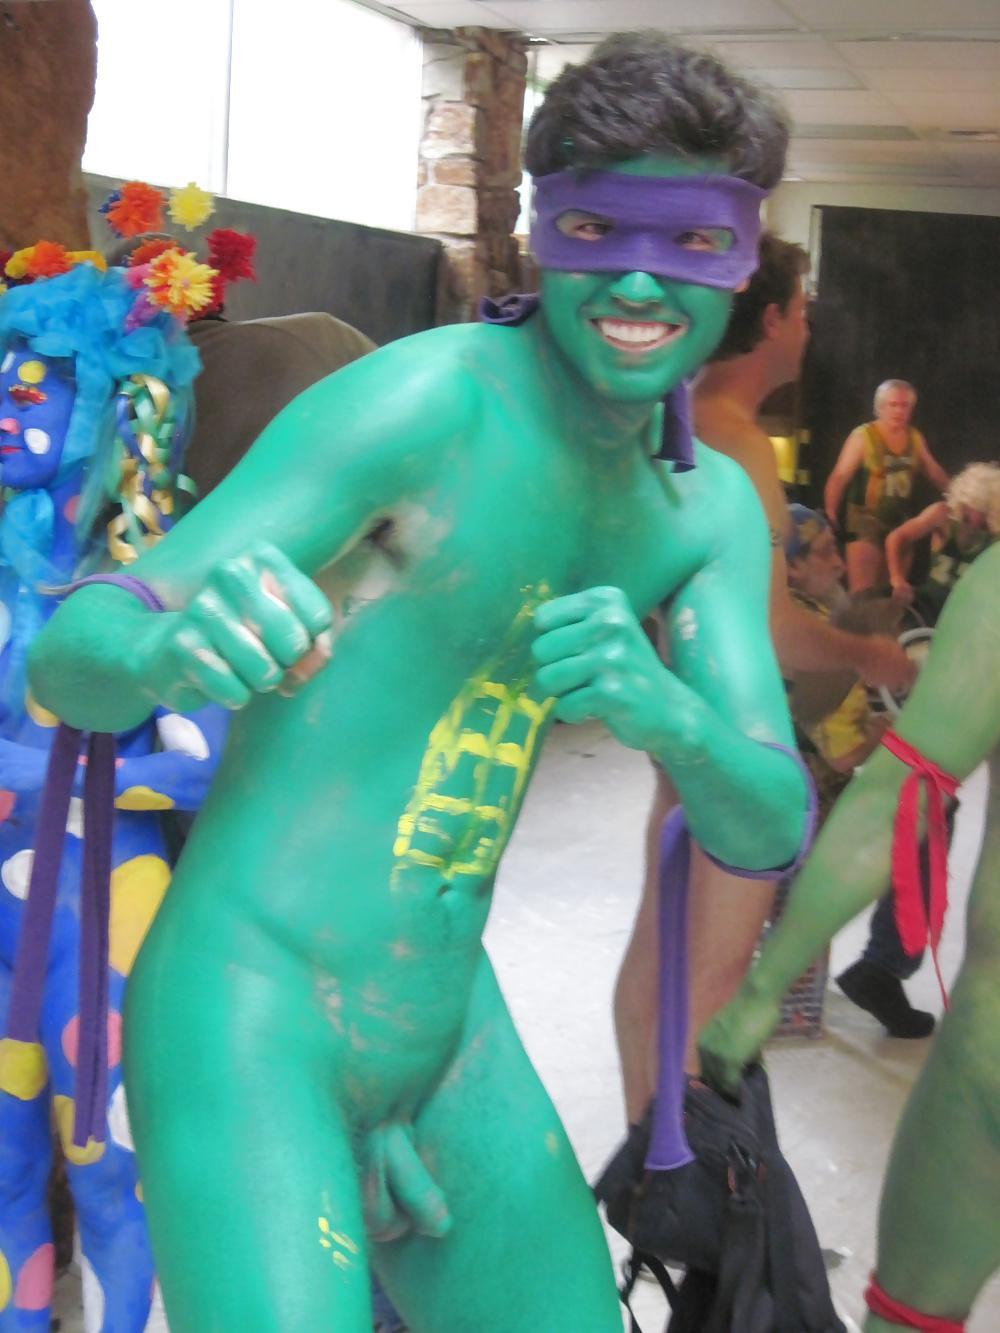 naked-bodypainting-boys-lindsay-lohan-nude-upskirt